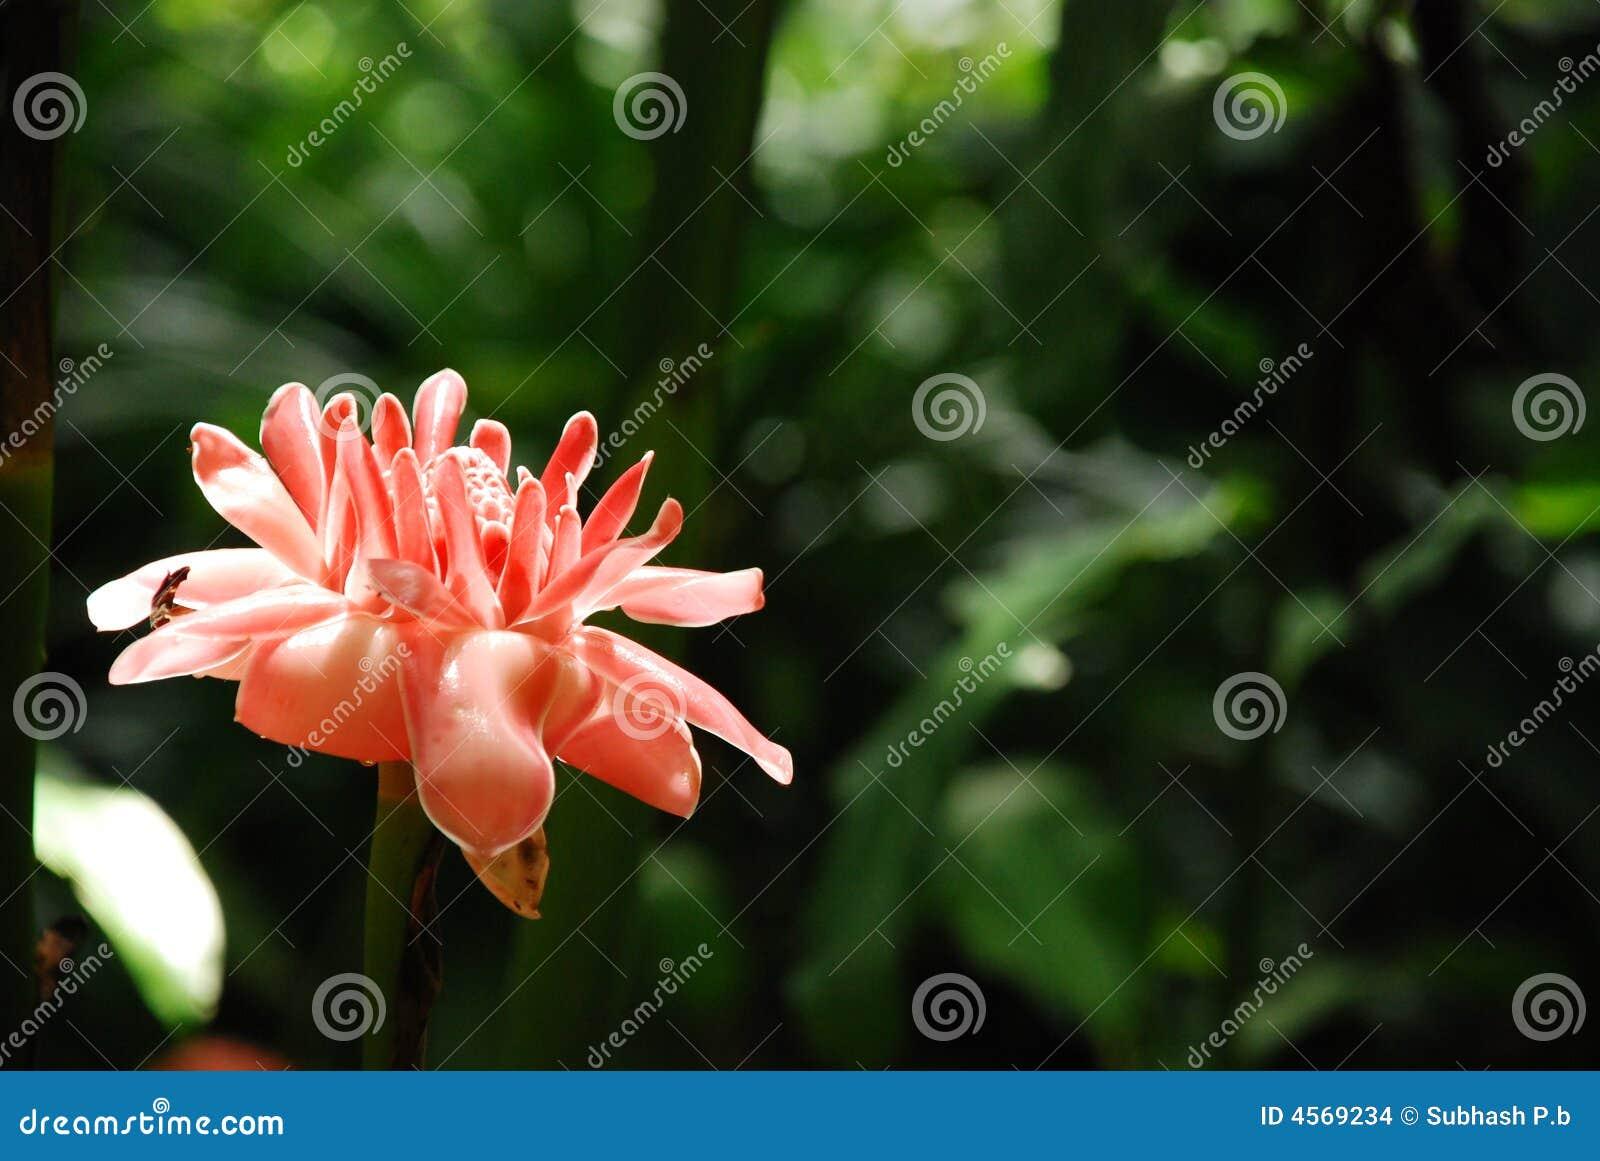 Fleur de gingembre